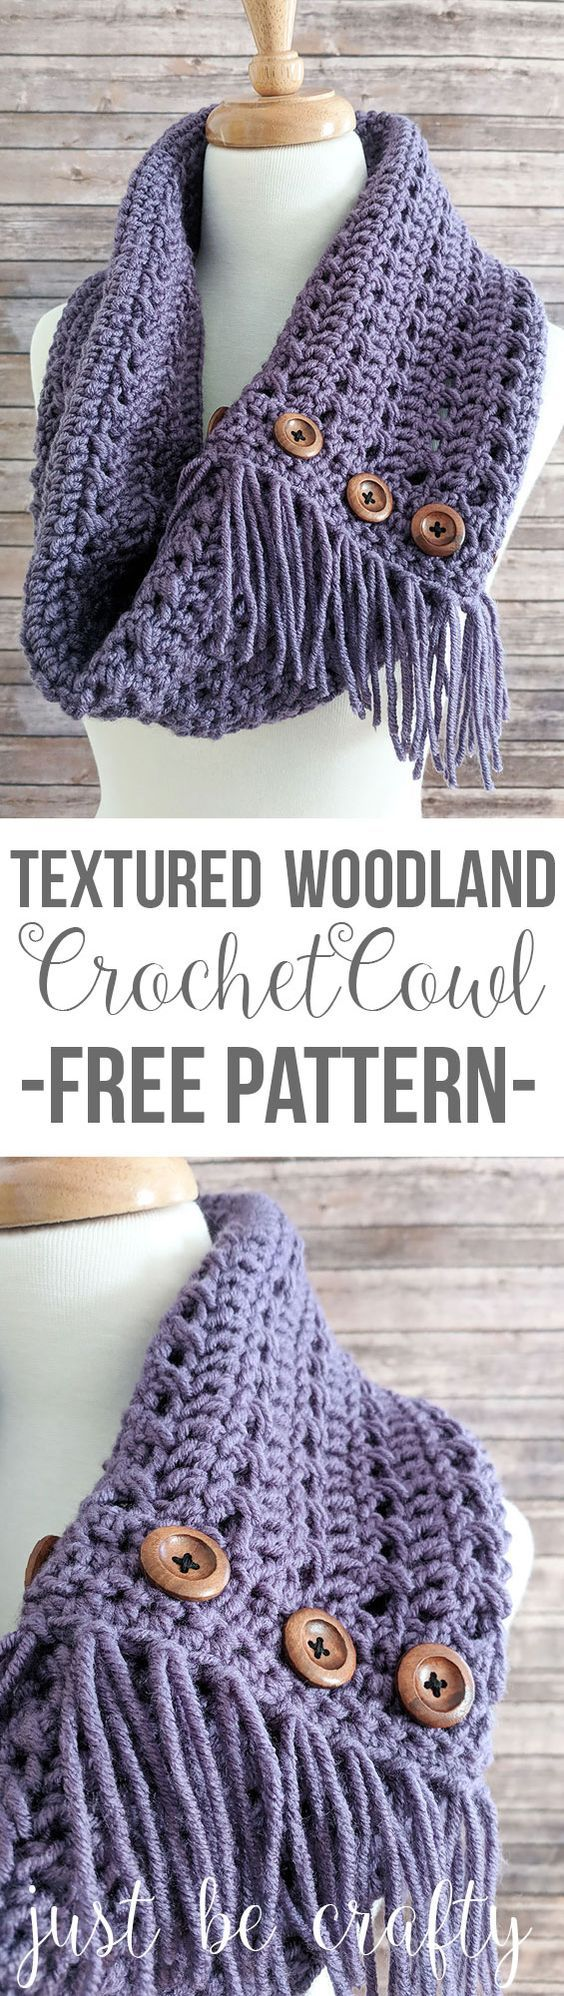 Mejores 1013 imágenes de Crocheting en Pinterest   Ideas de ...